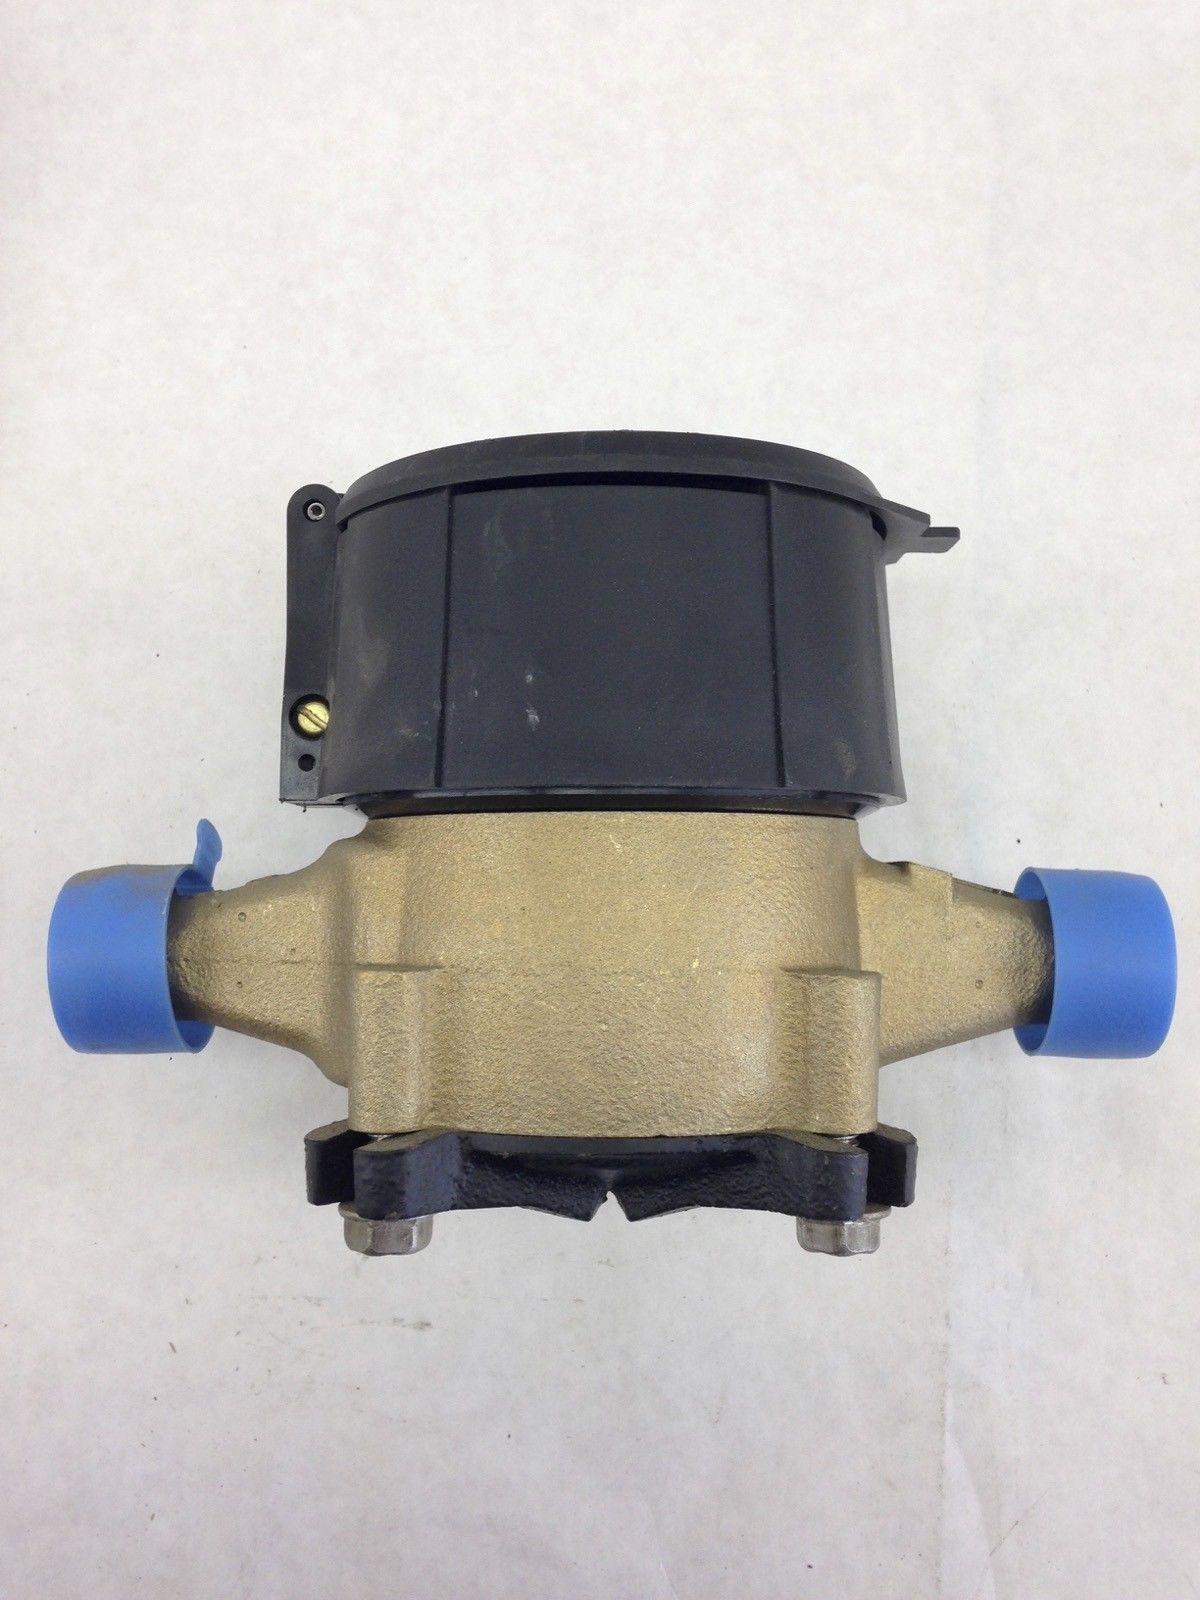 OMEGA FTB6107 A C700 WATER FLOW METER 5/8� (B443) 2